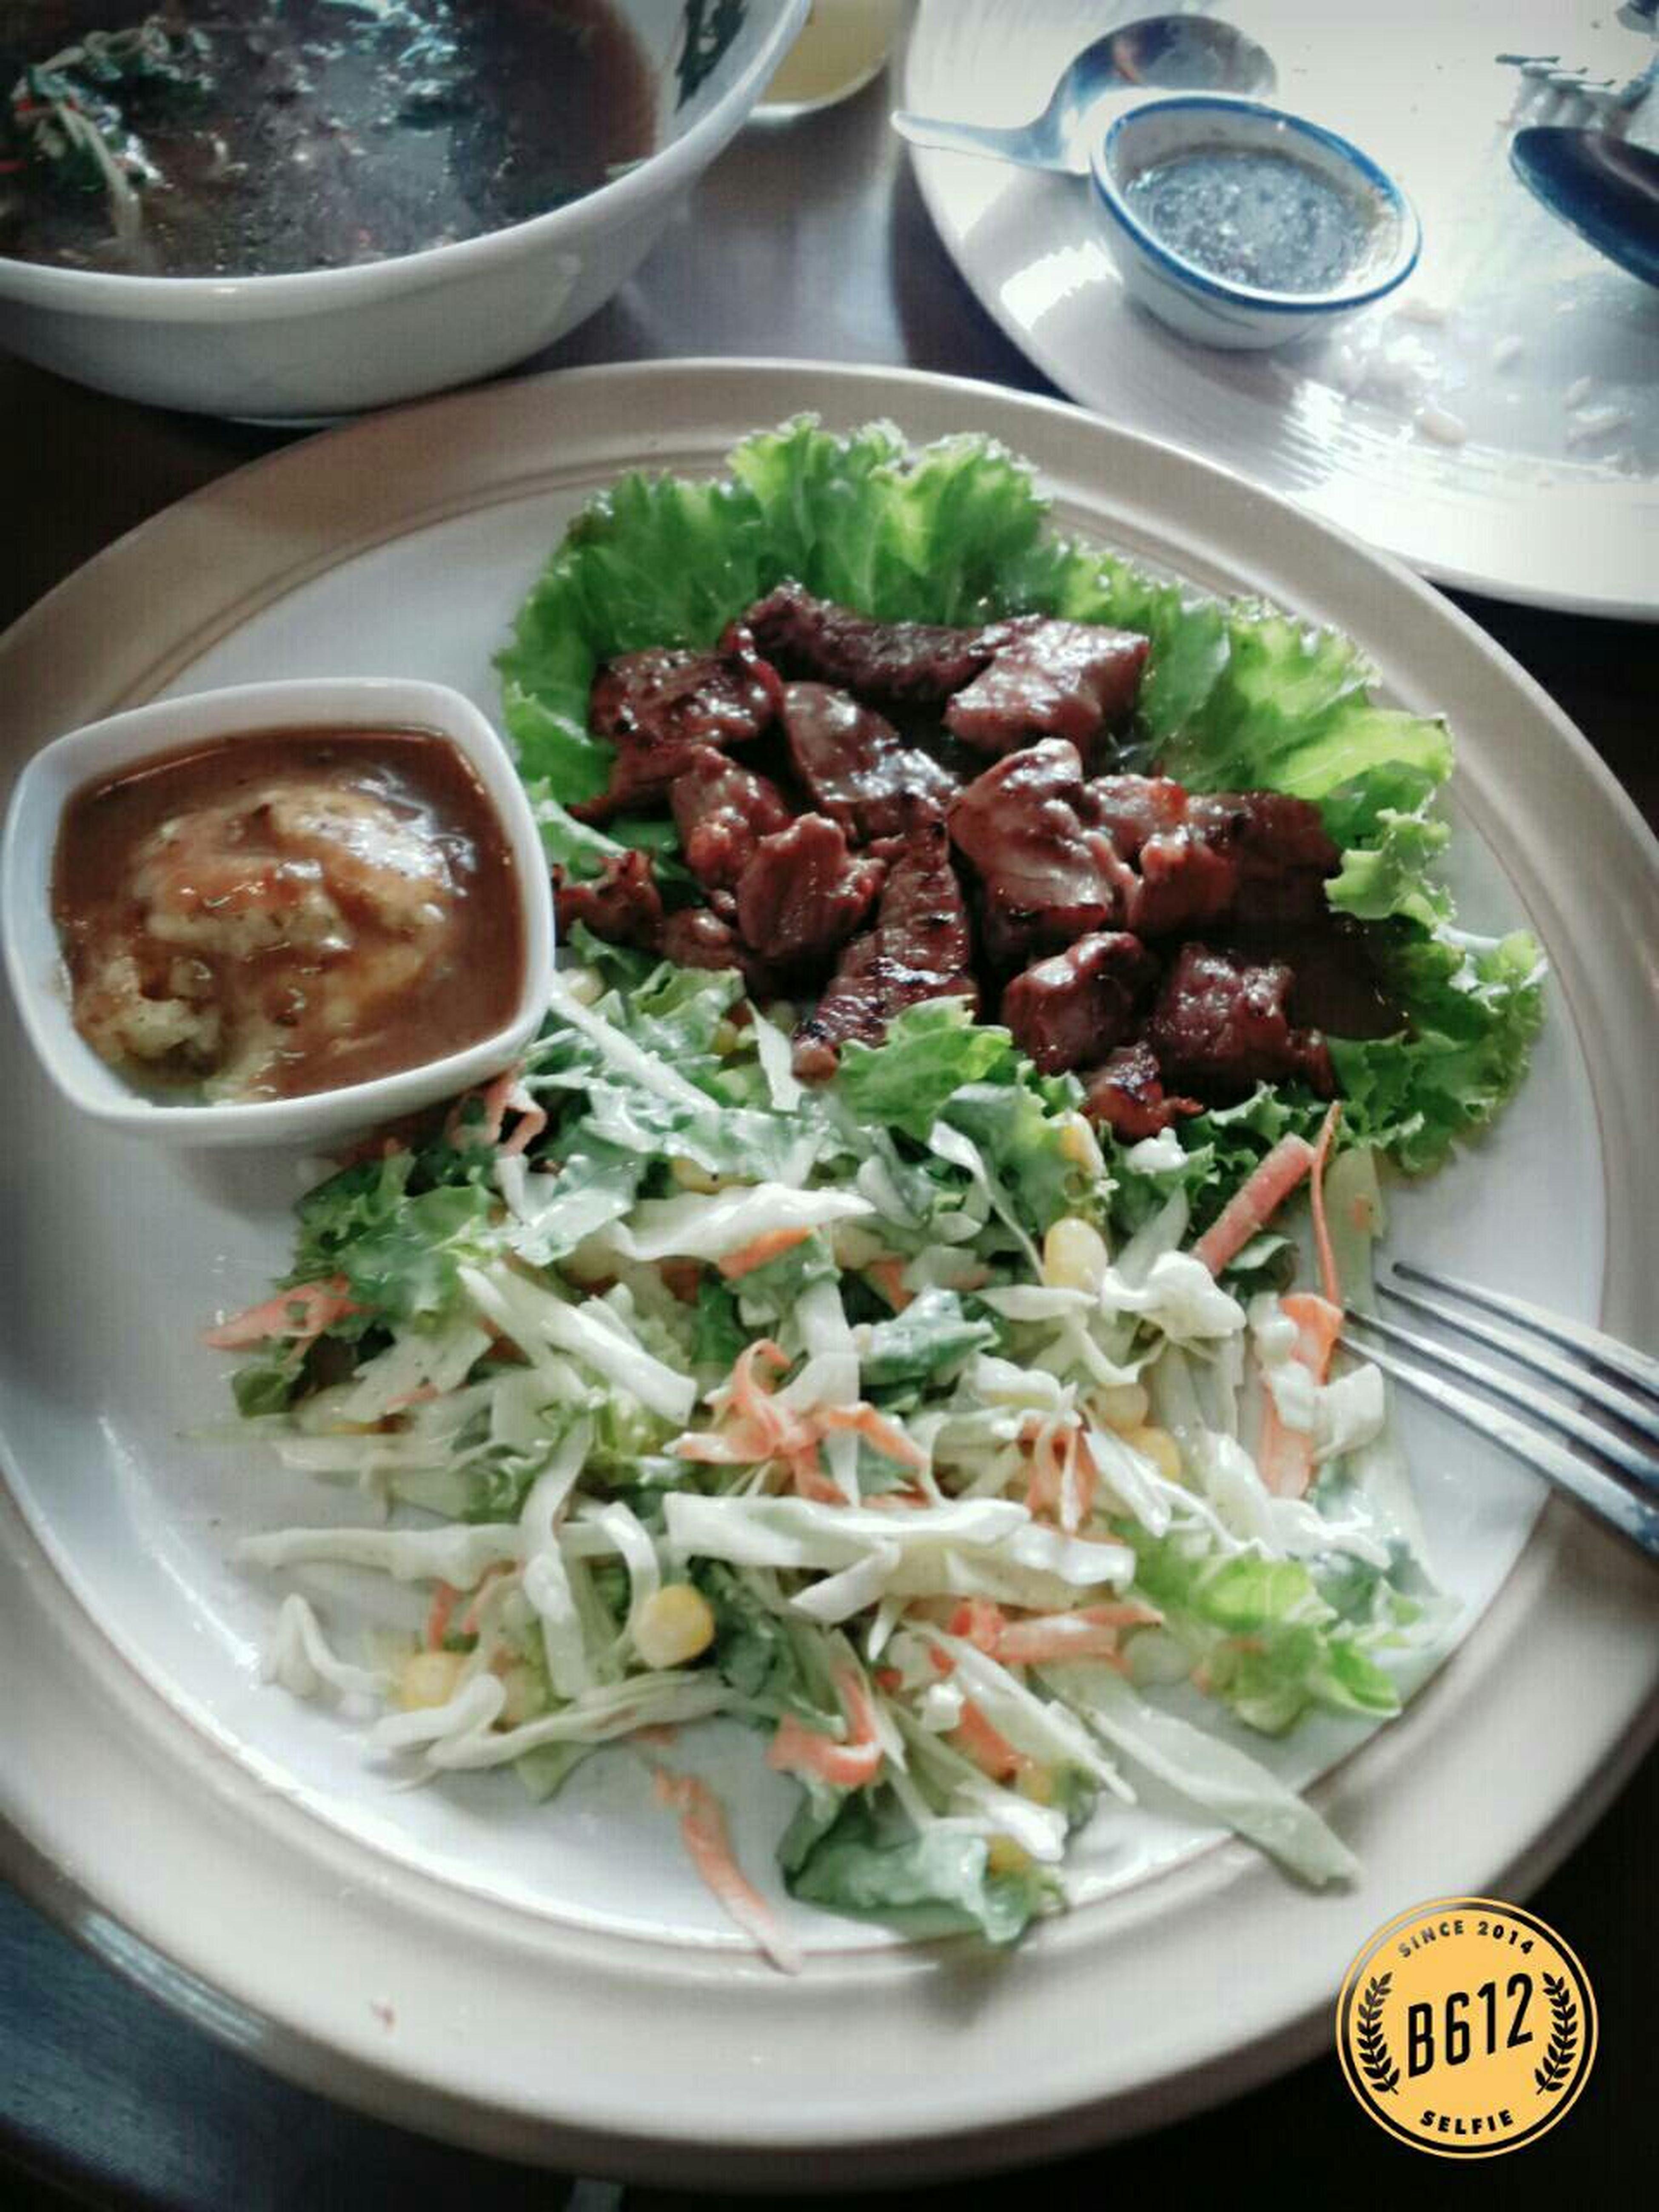 Lunch My Friend ❤ อร่อยดีอ่ะ